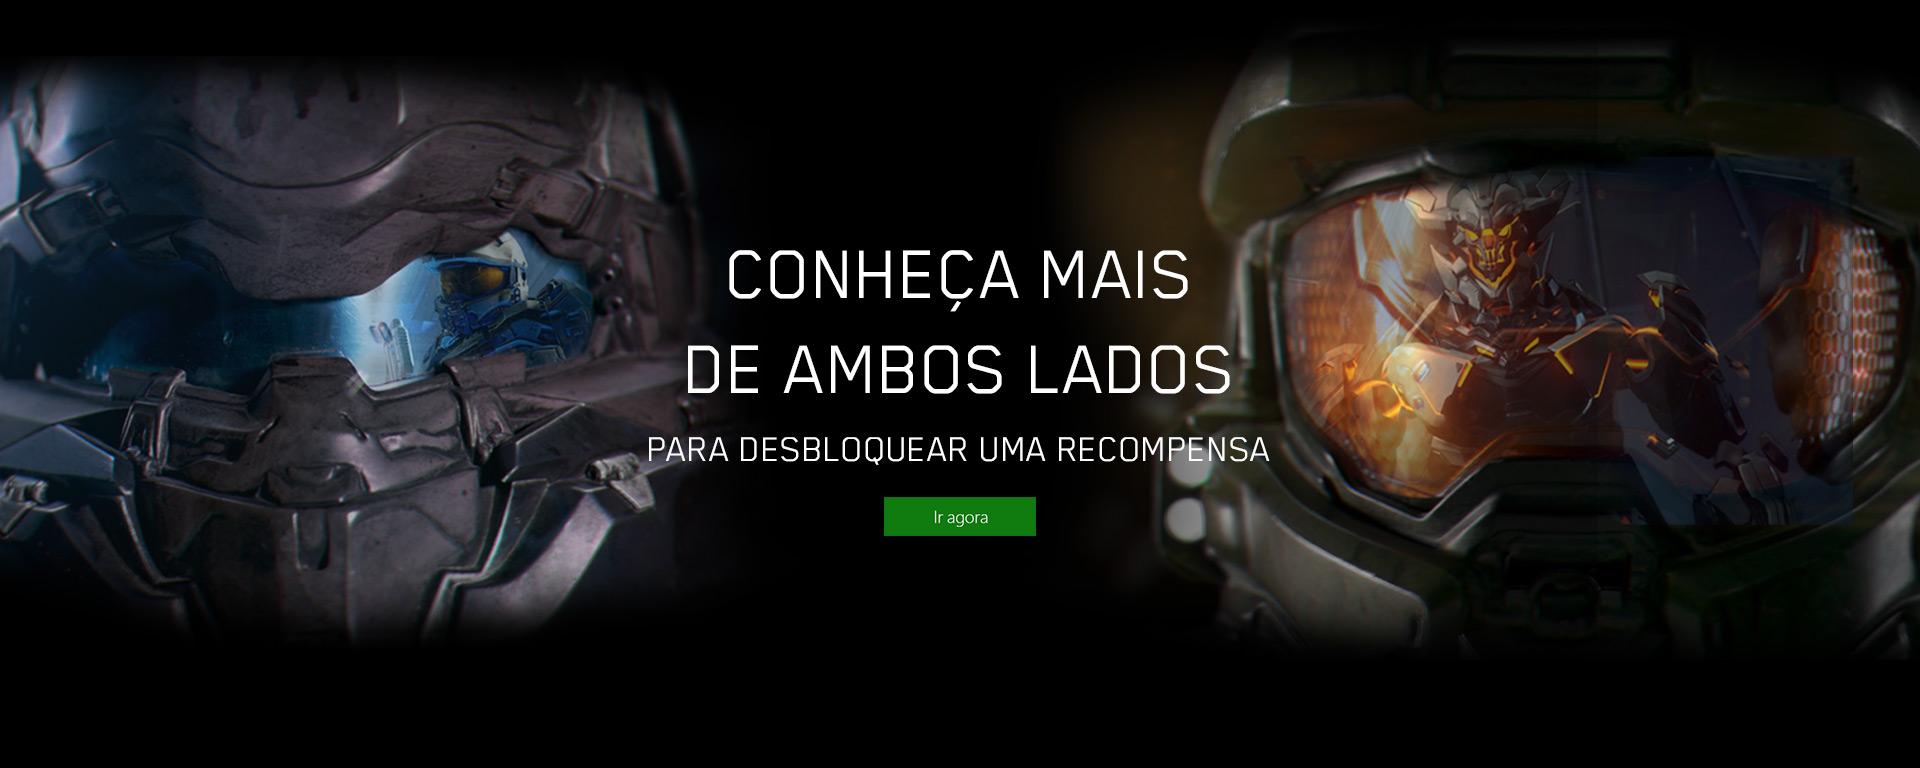 Halo 5 Guardians hero image